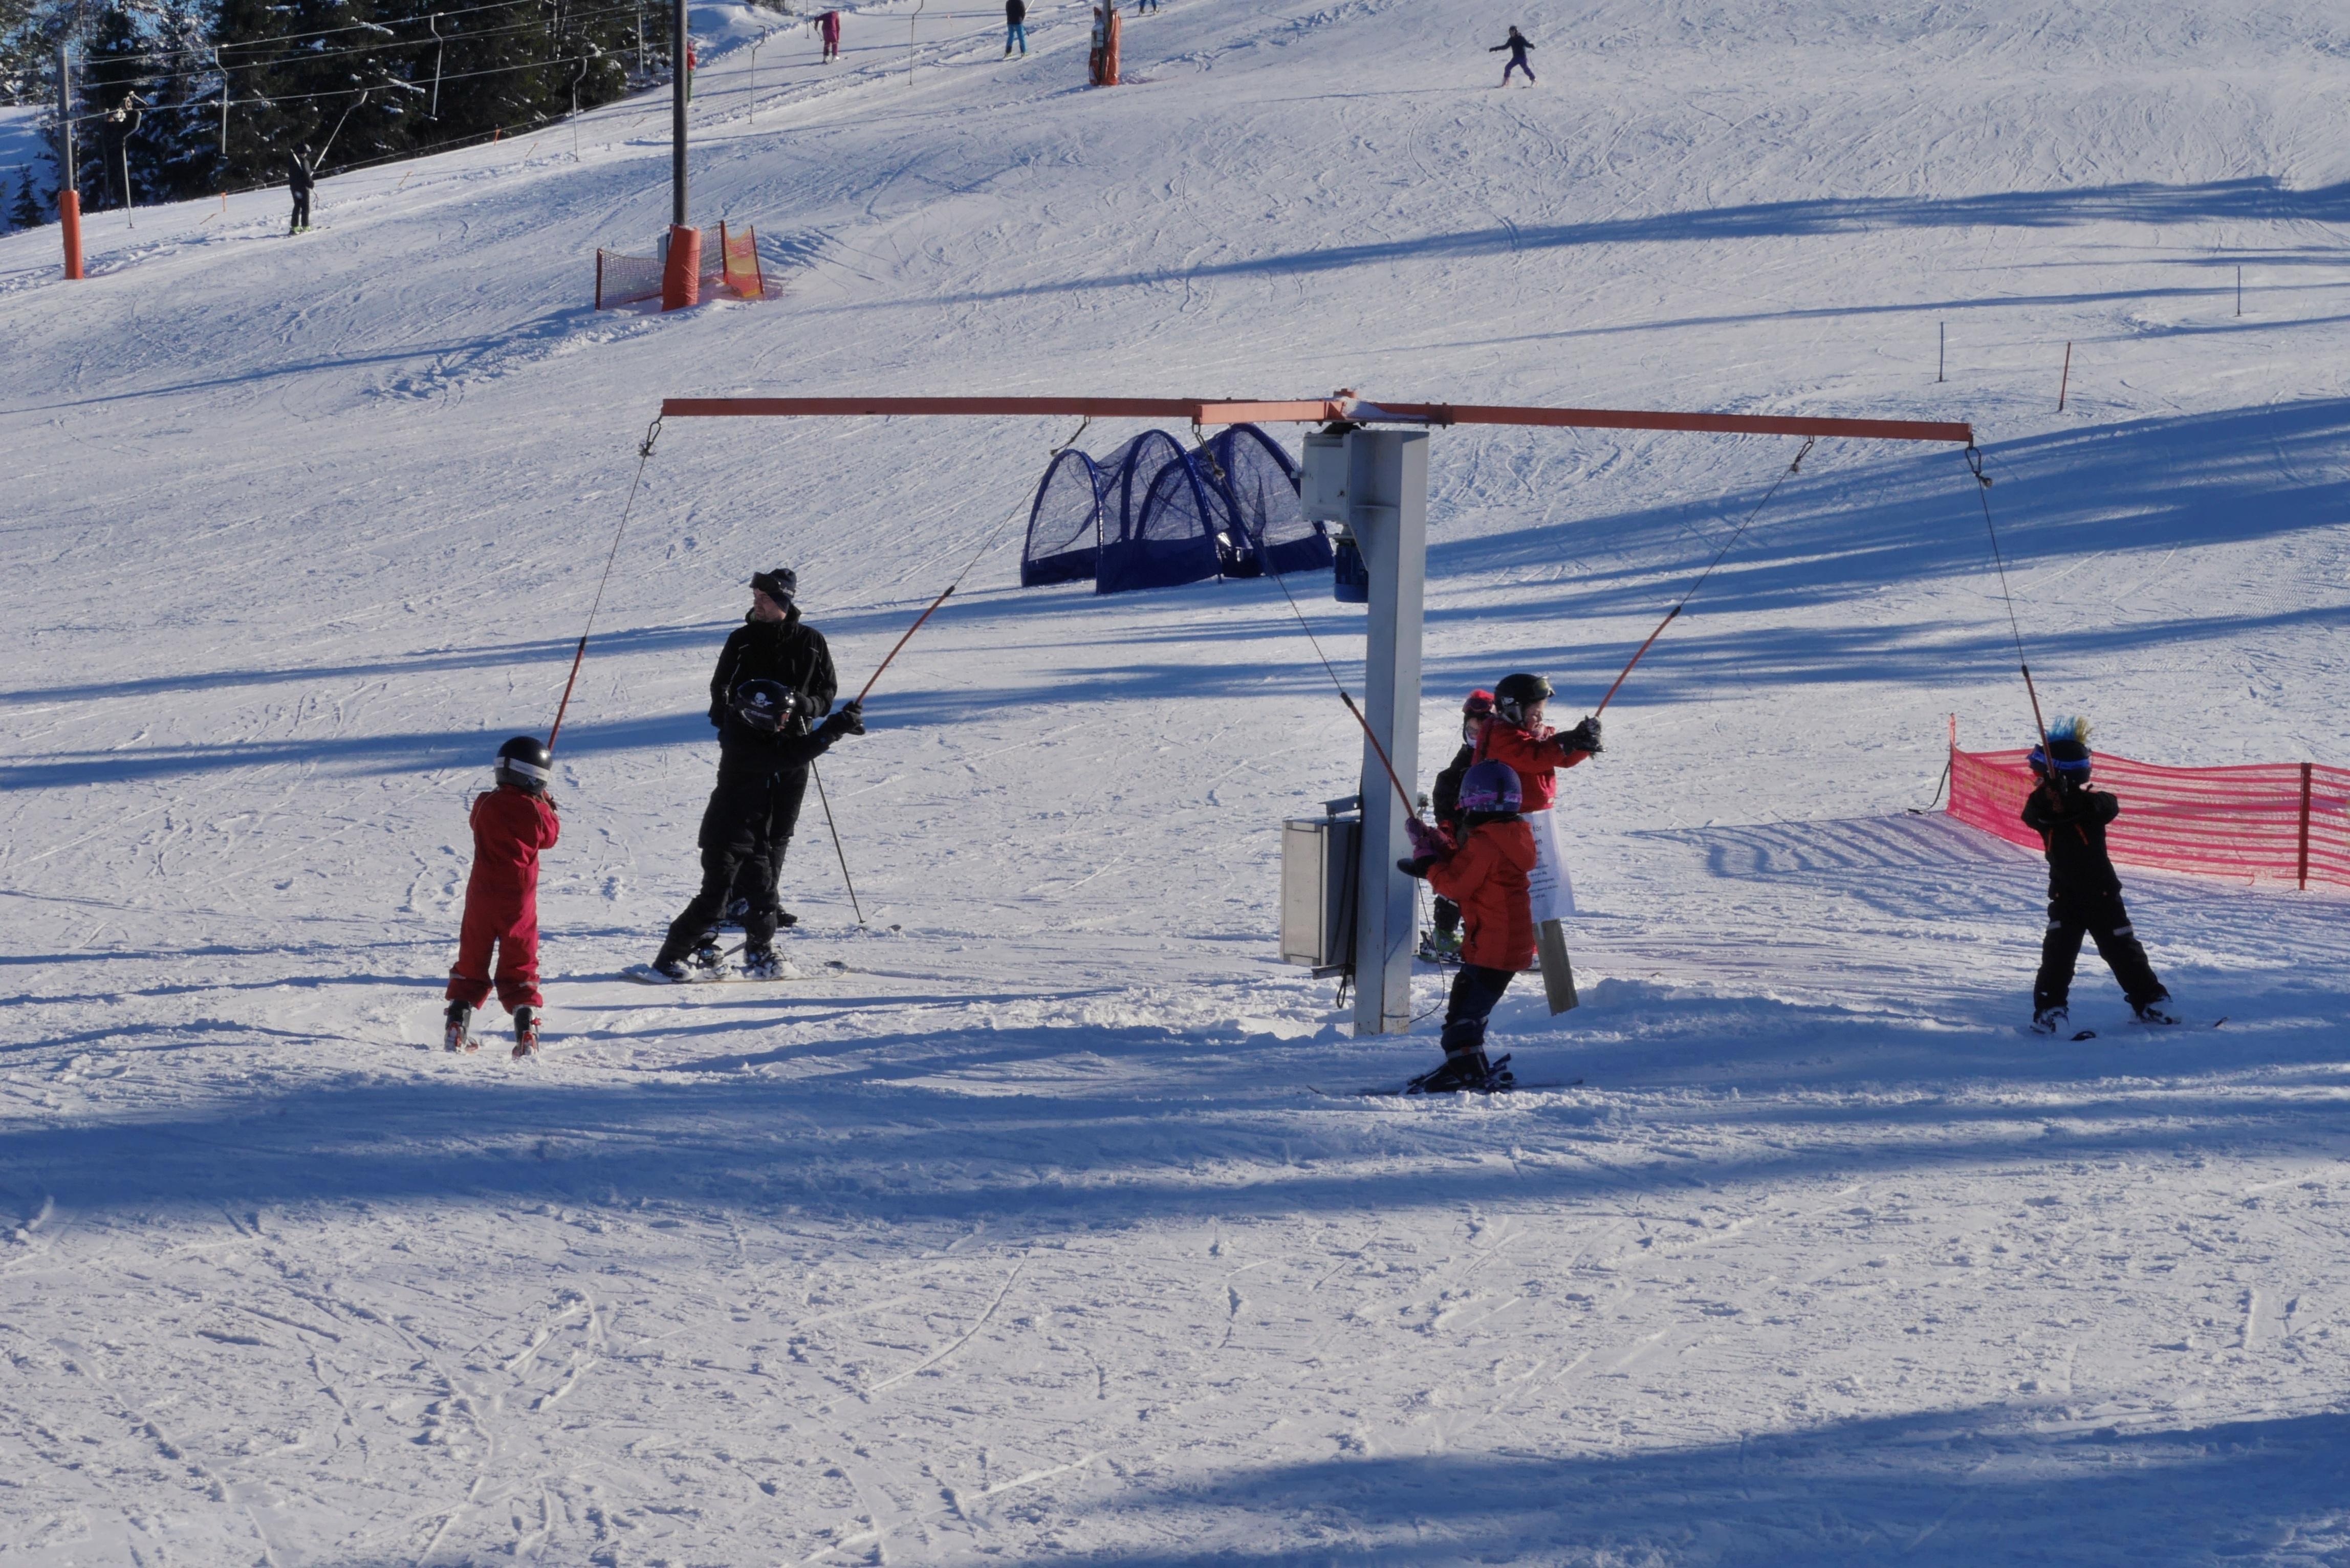 kleine-kindjes-skien-